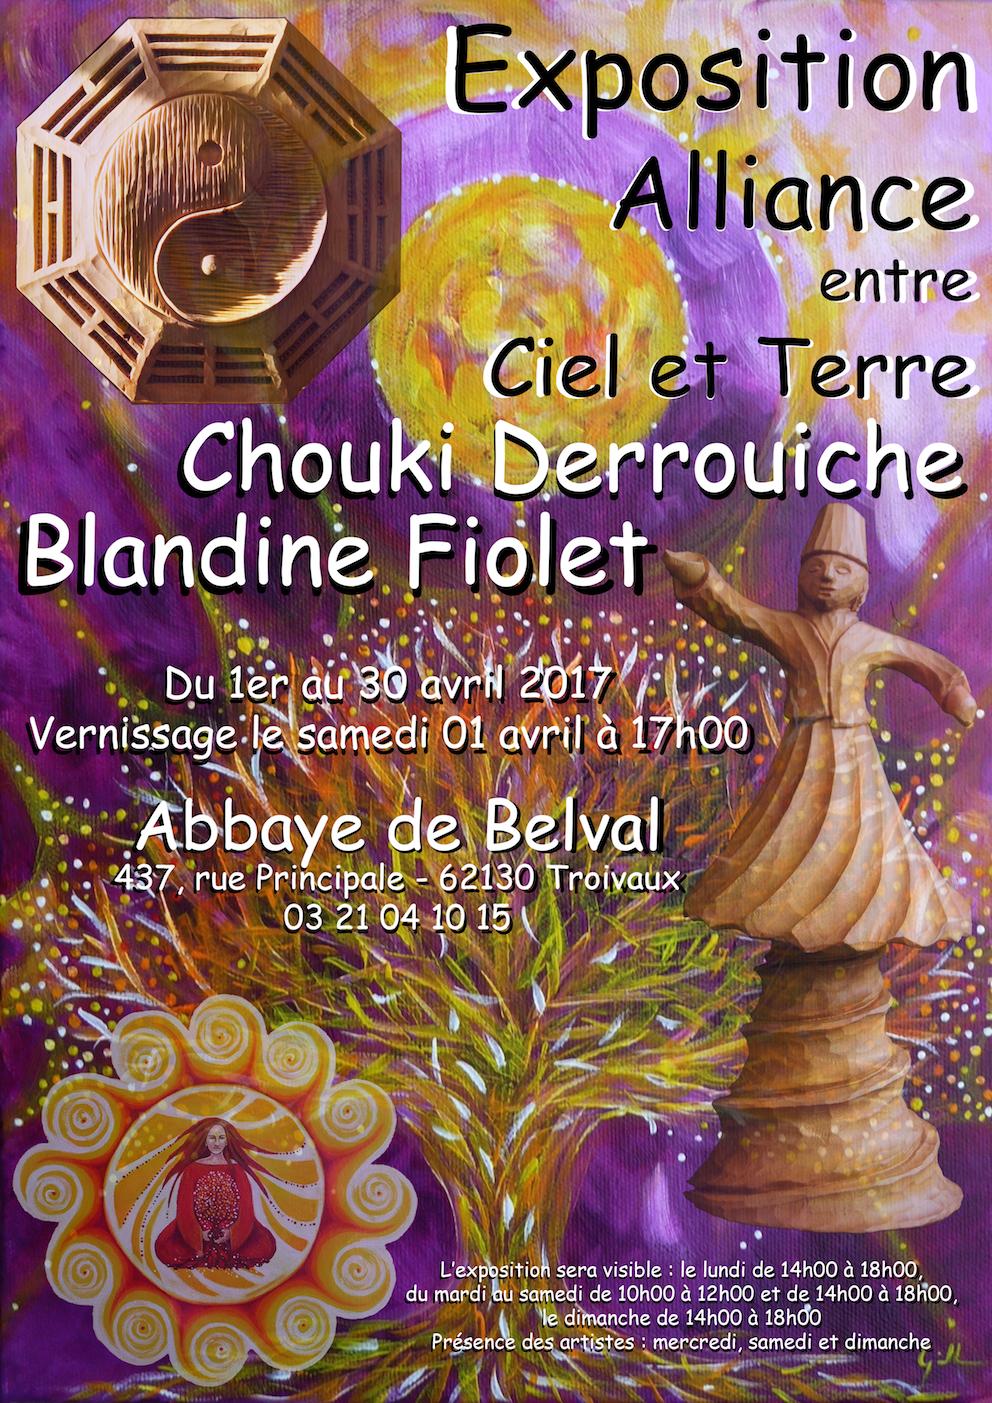 http://www.saphirnews.com/agenda/Exposition-Alliance-entre-Ciel-et-Terre_ae429694.html